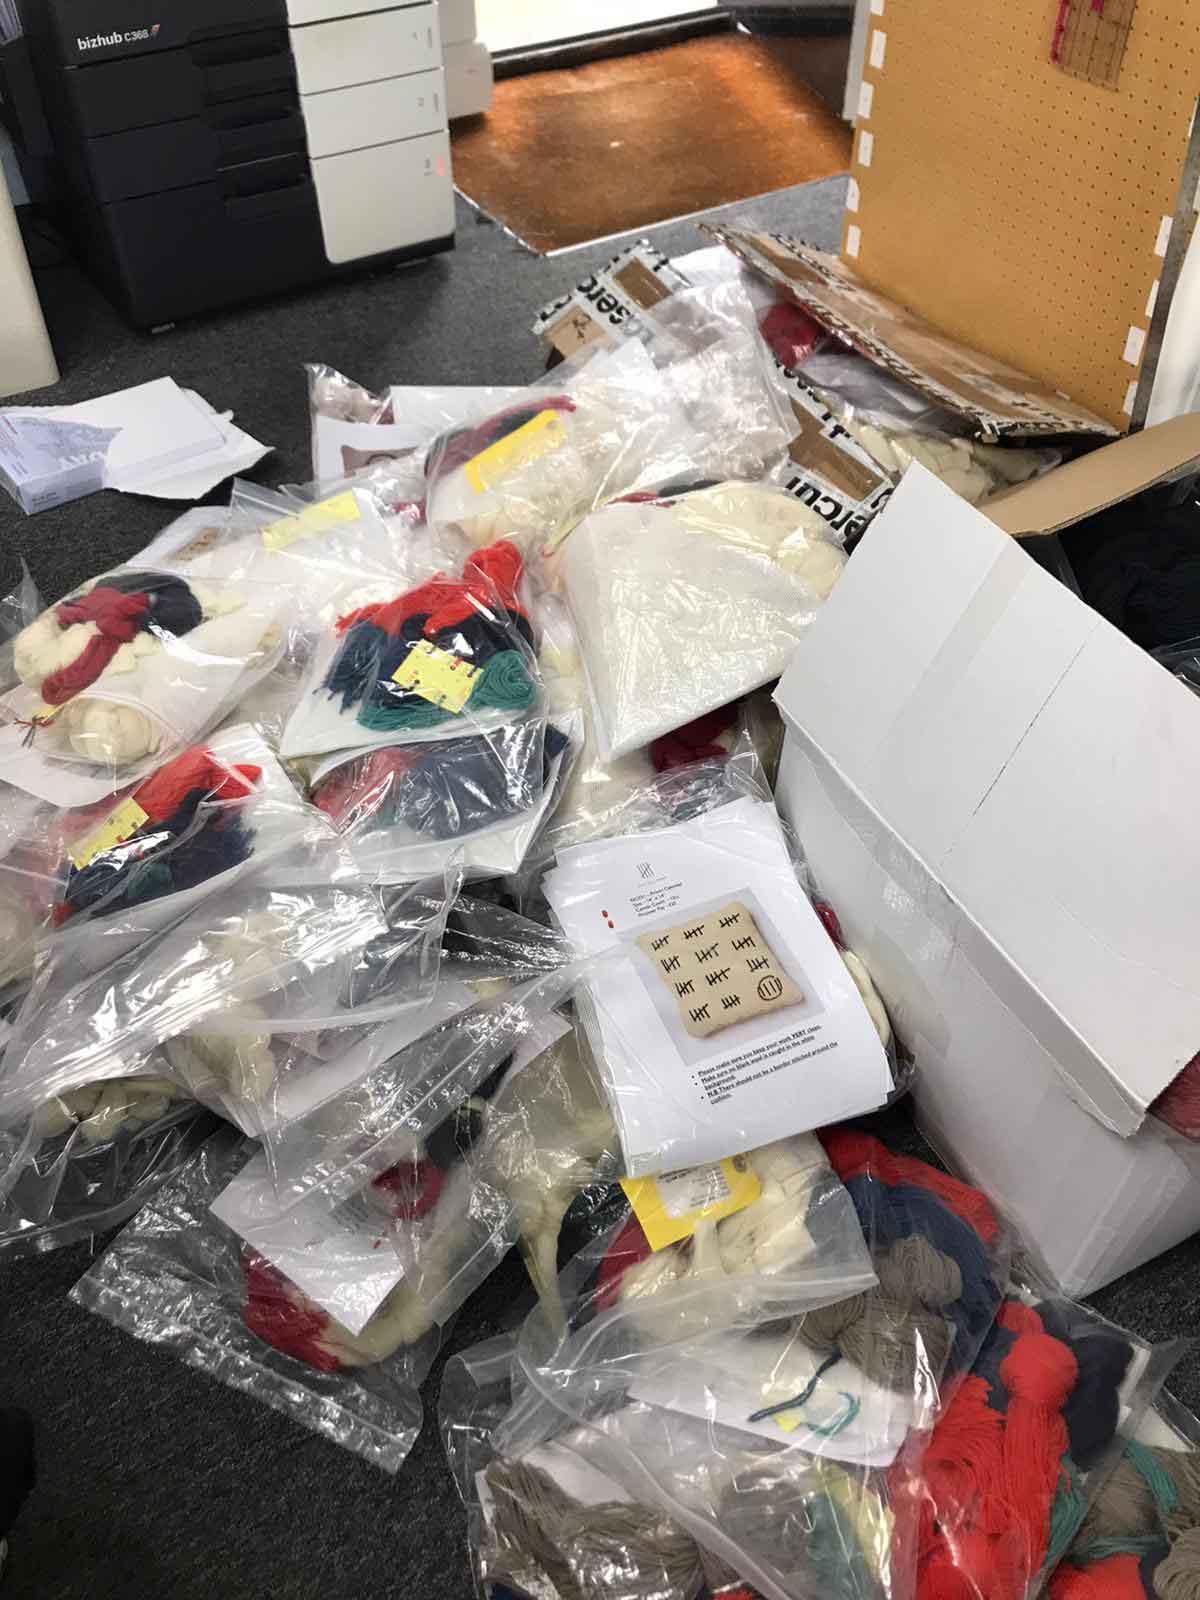 Fine Cell Work stitching kits